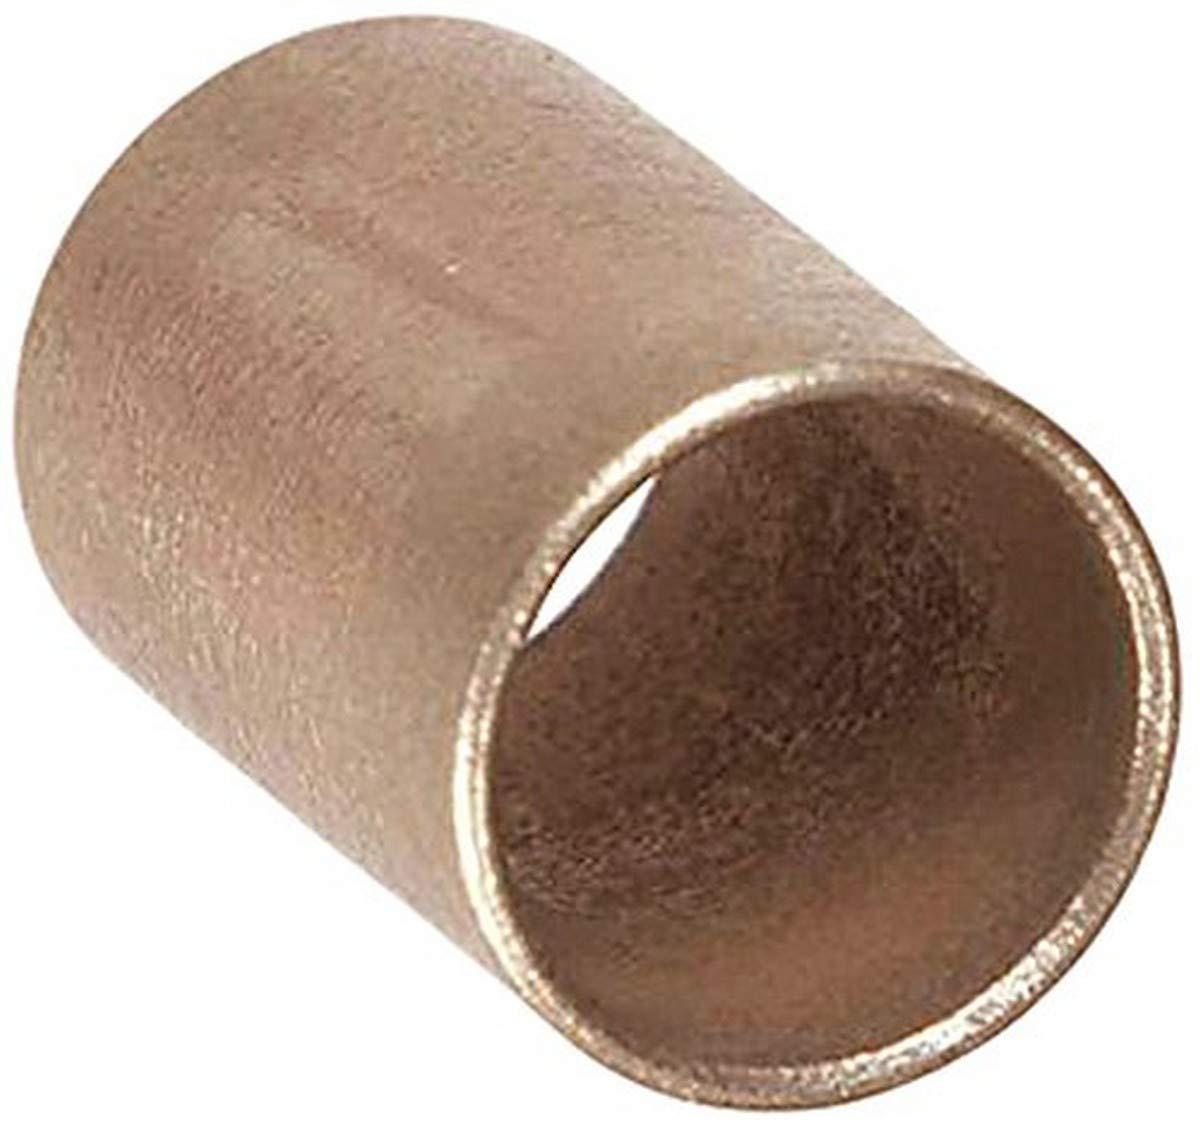 Pack of 10 Isostatics 101050-10 AA-347-3 SAE841 Oilube Powdered Metal Bronze Sleeve Bearings//Bushings